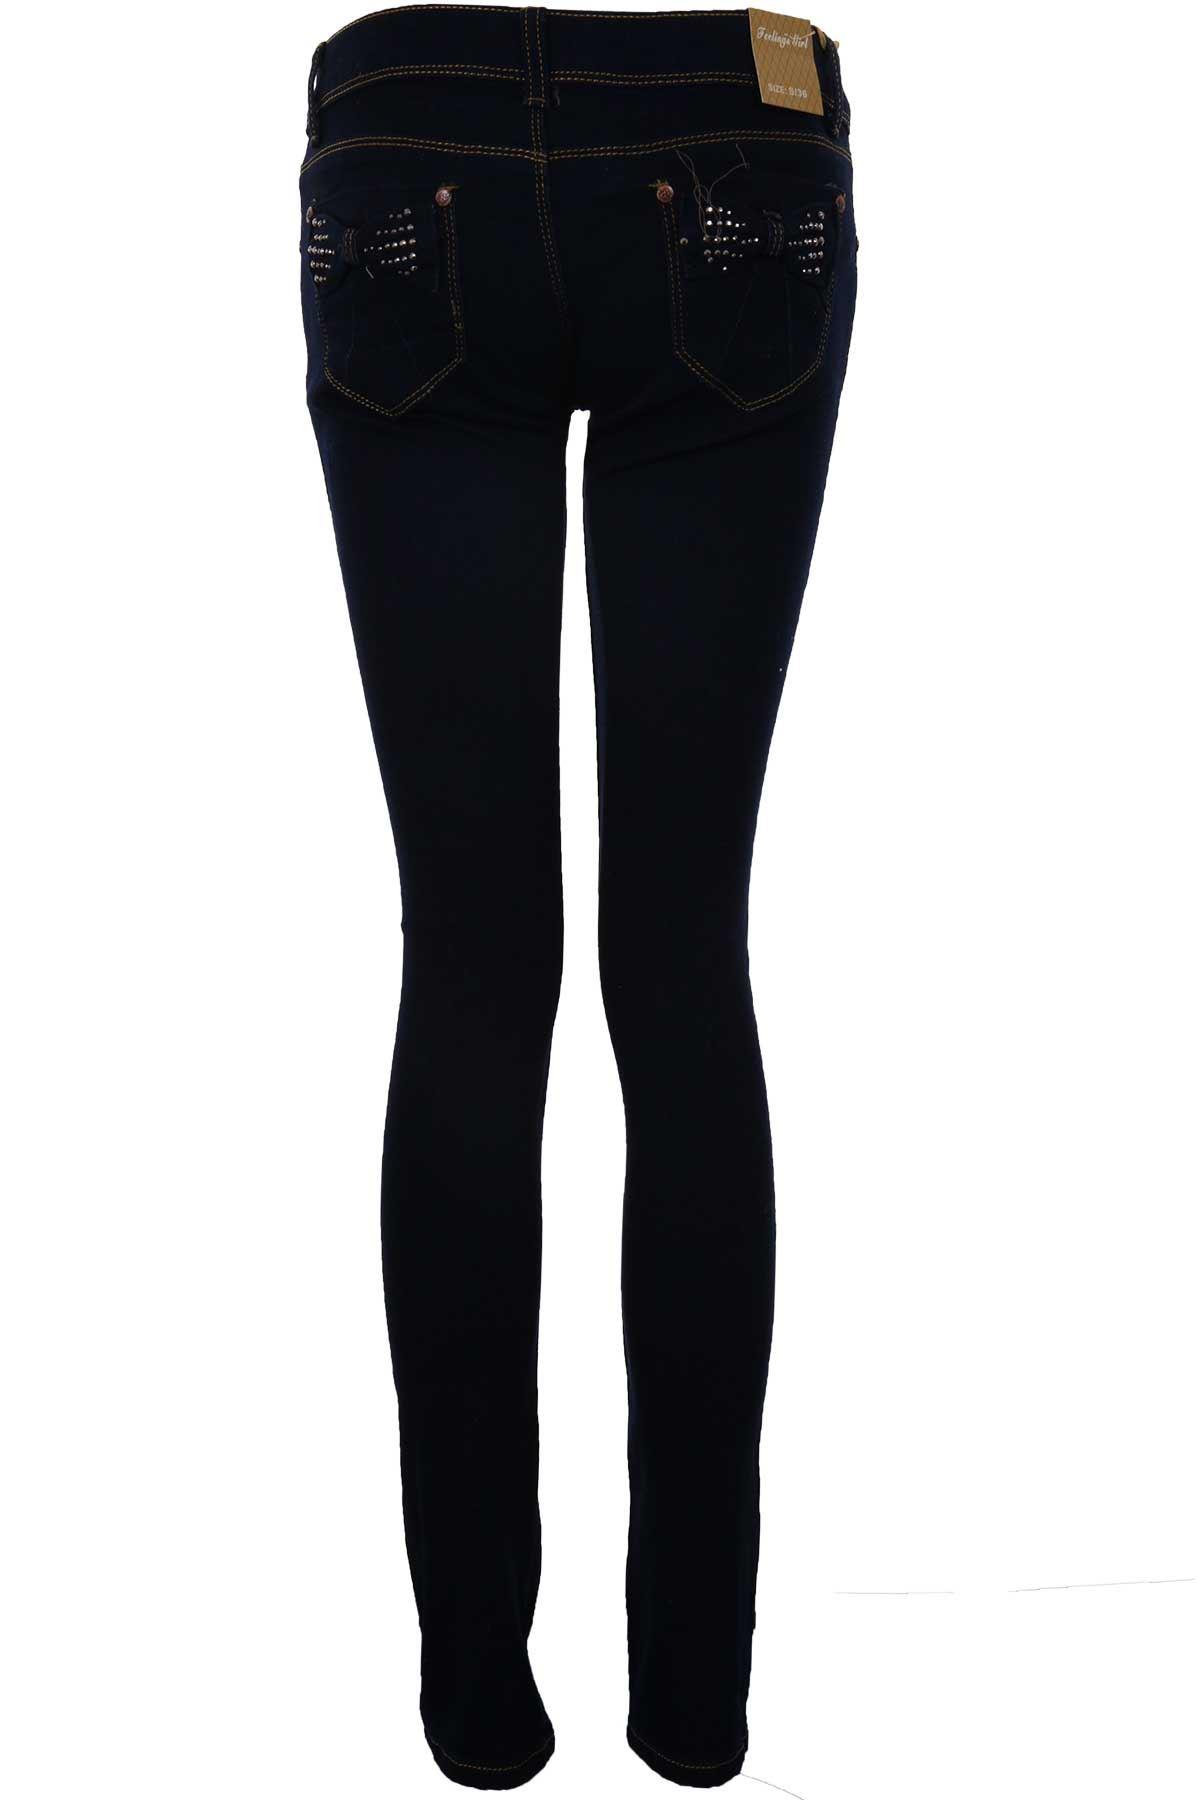 damen dunkel jeans hell acid wash damen hoher bund zerrissen hautenge jeans ebay. Black Bedroom Furniture Sets. Home Design Ideas